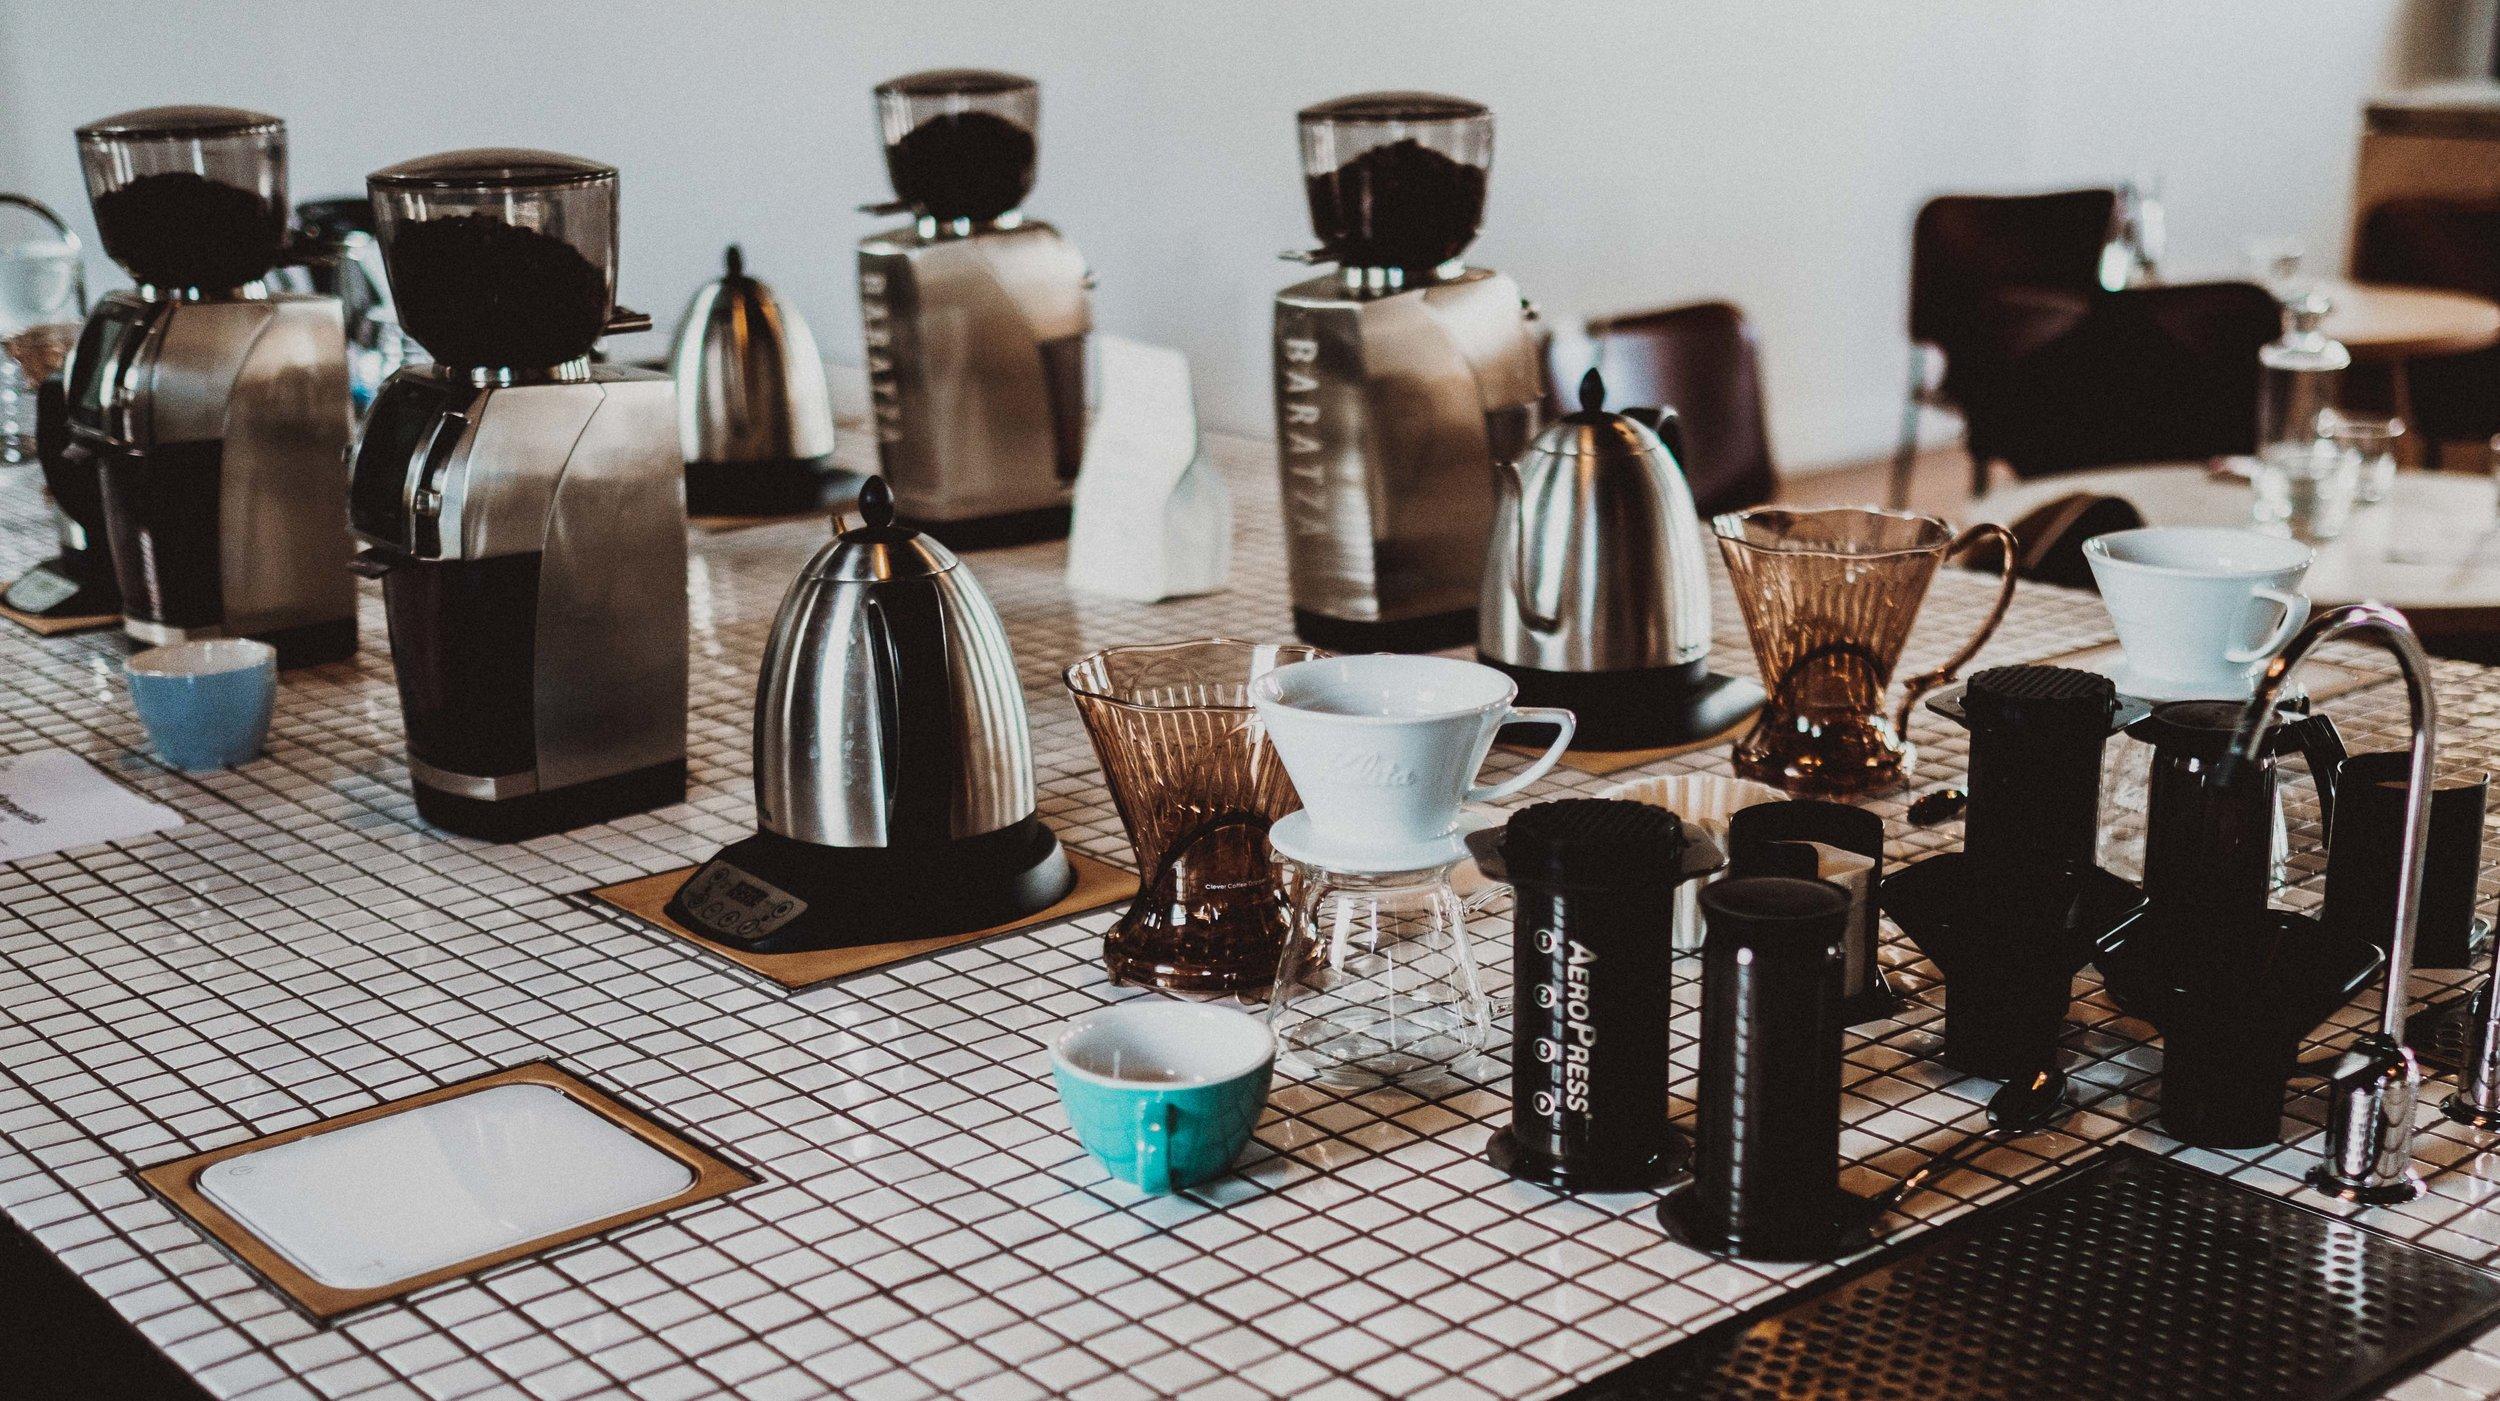 filtercoffee.jpg